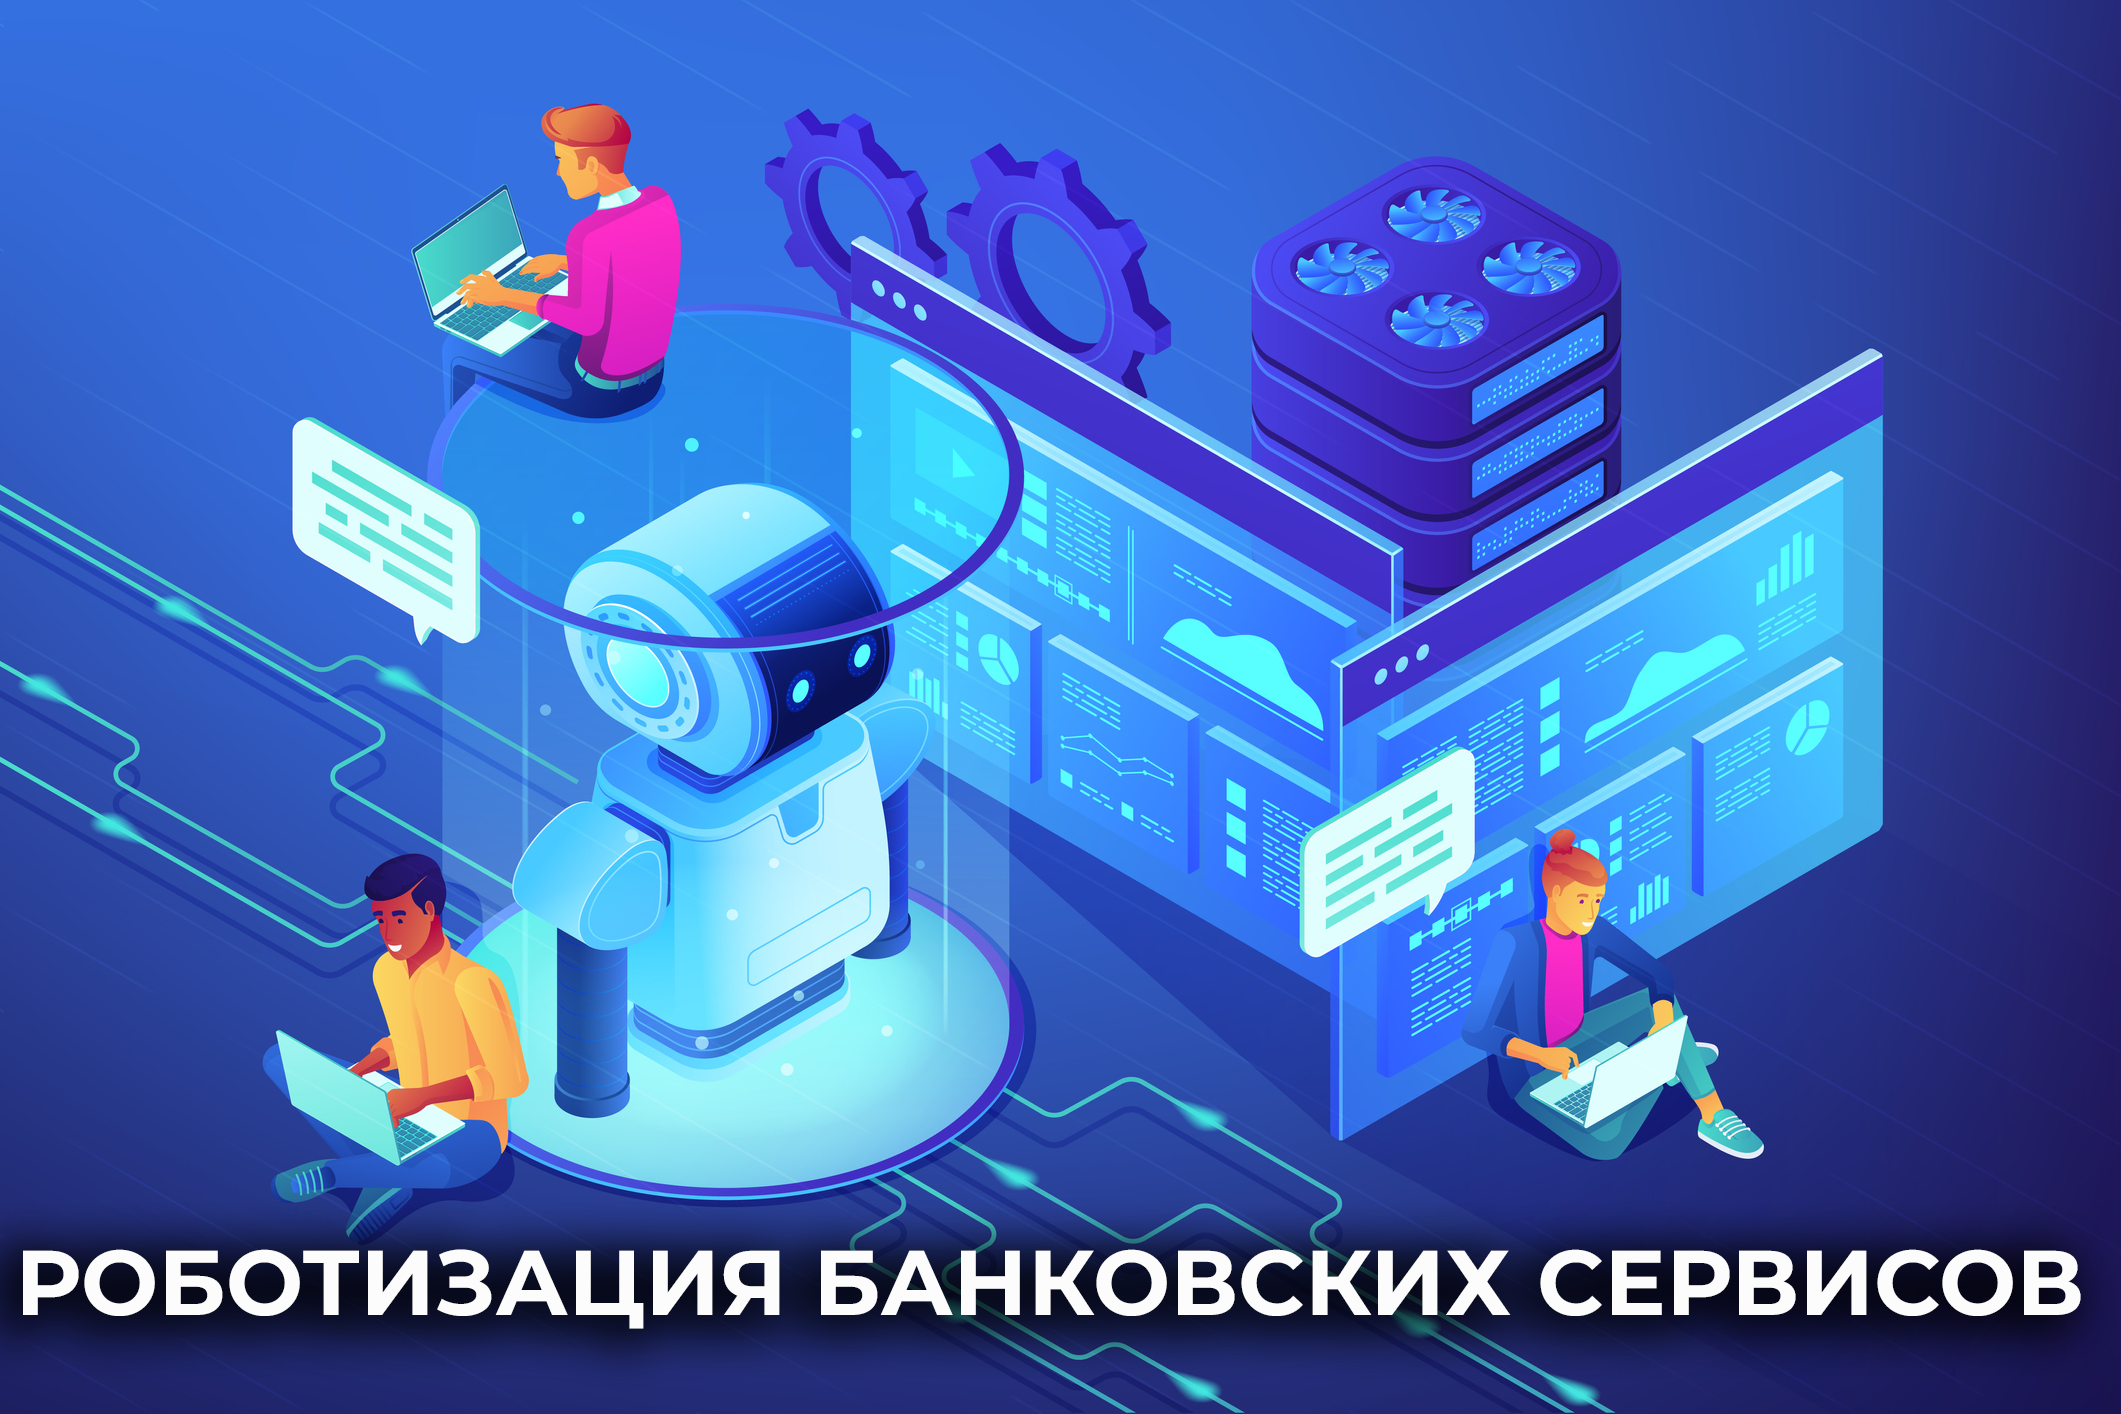 Роботизация банковских сервисов